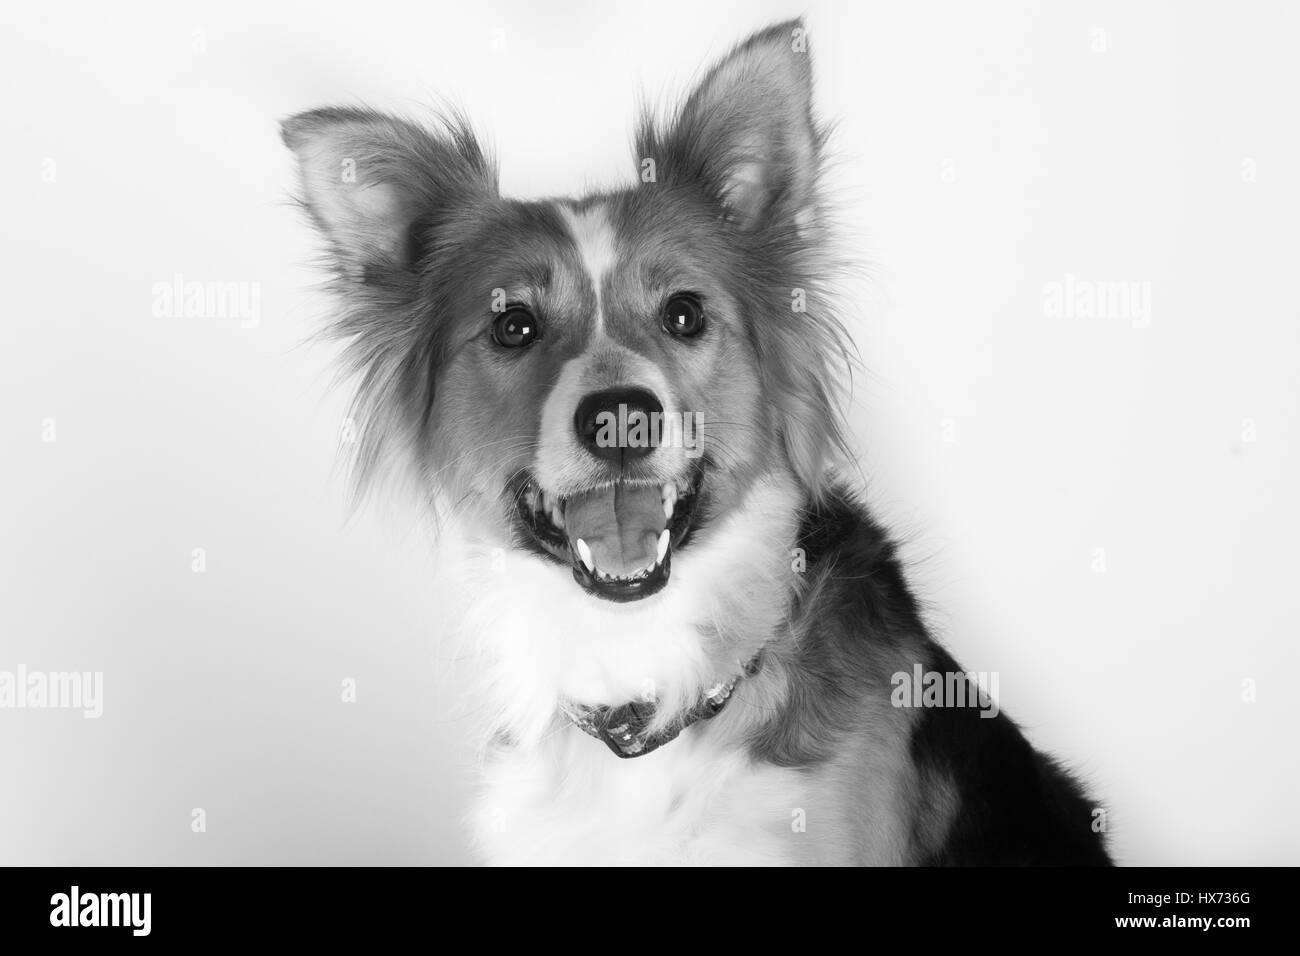 Shirley, The Beatiful collie - Stock Image